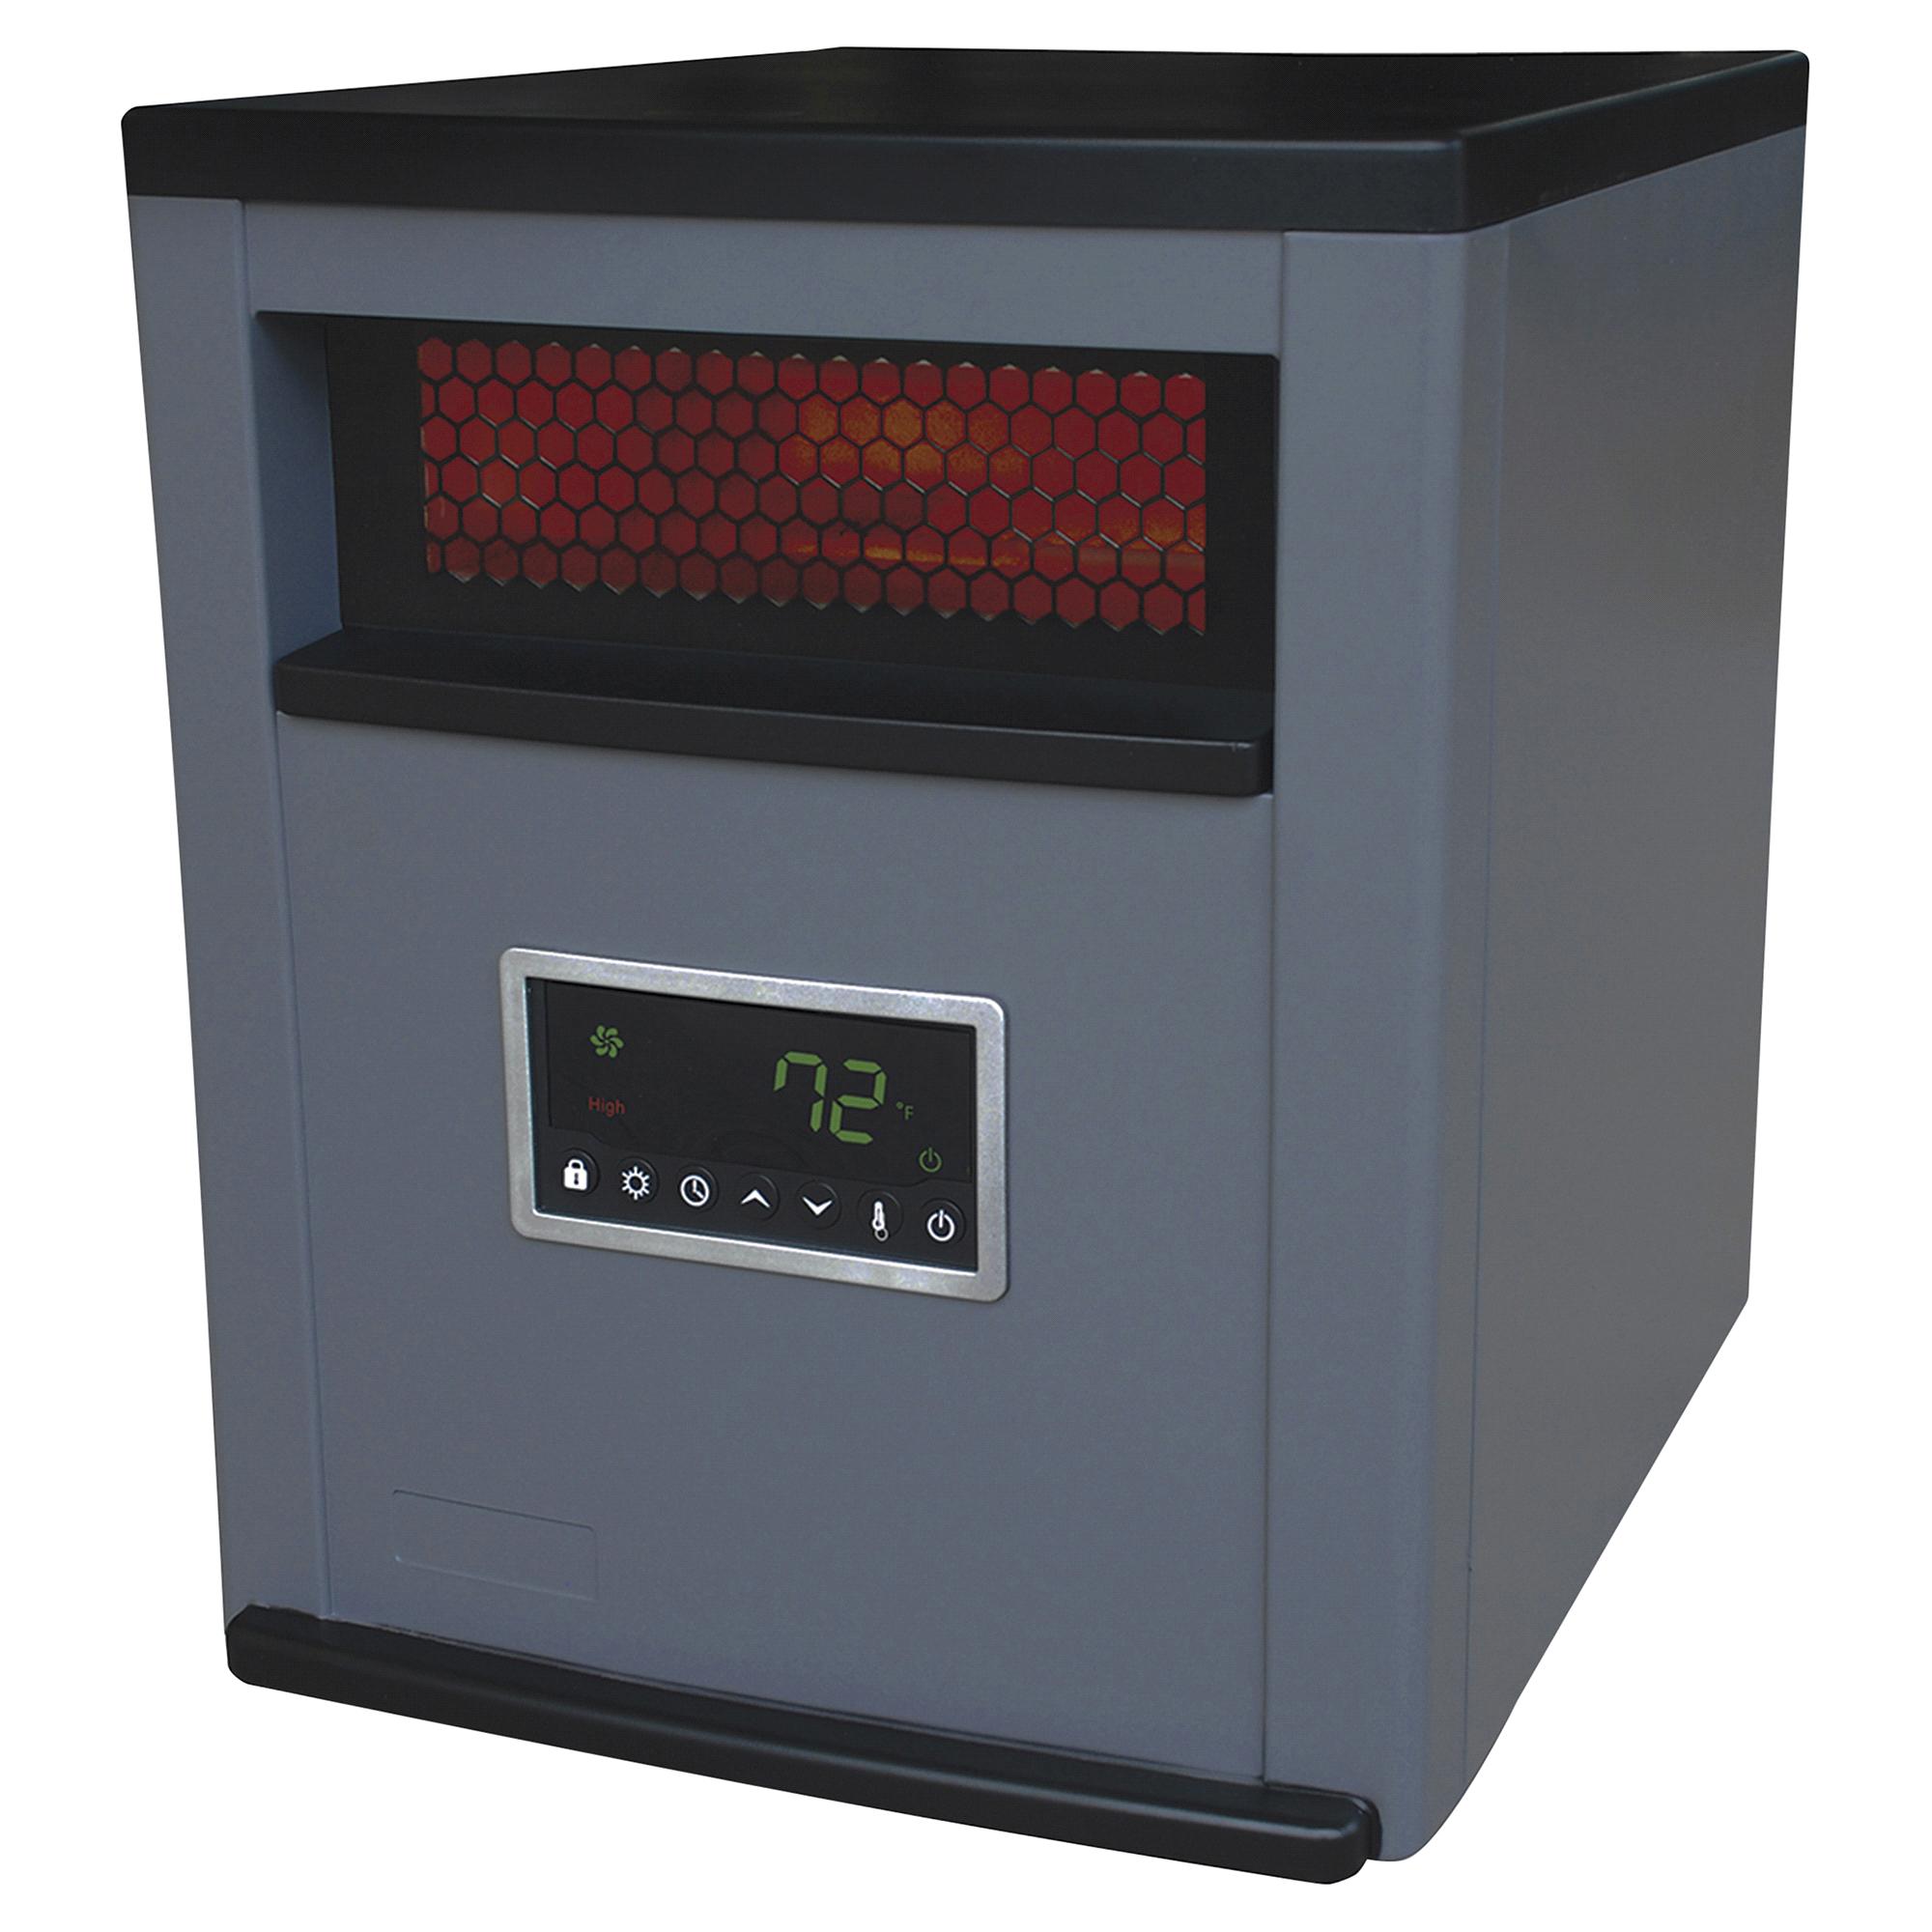 LifeSmart 6 Element Infrared Heater Two Tone Grey/Black Plastic ...